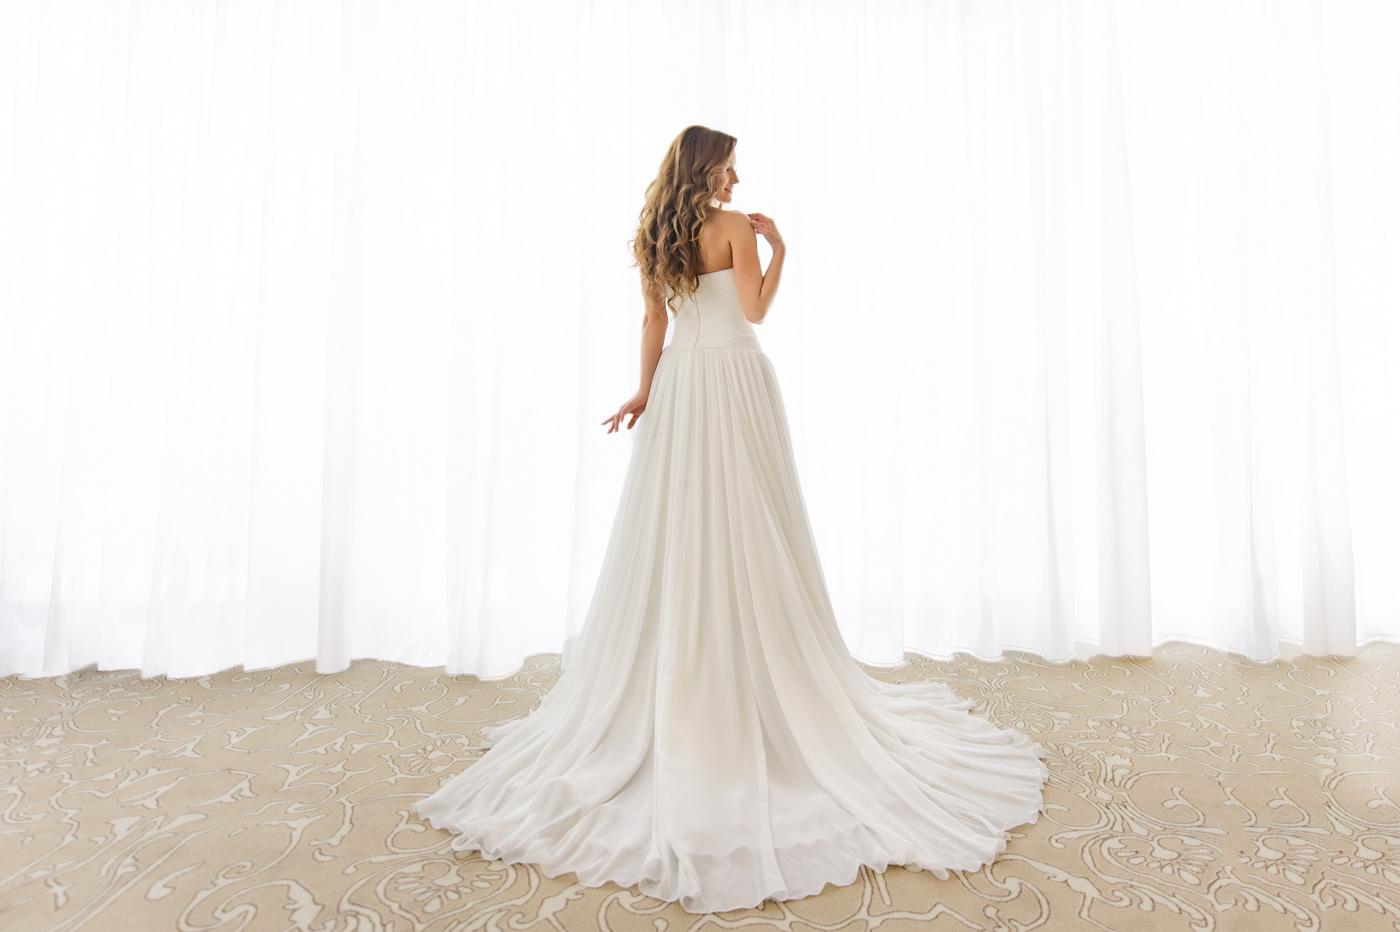 Destination Wedding Photographer_Marian Sterea_040.jpg